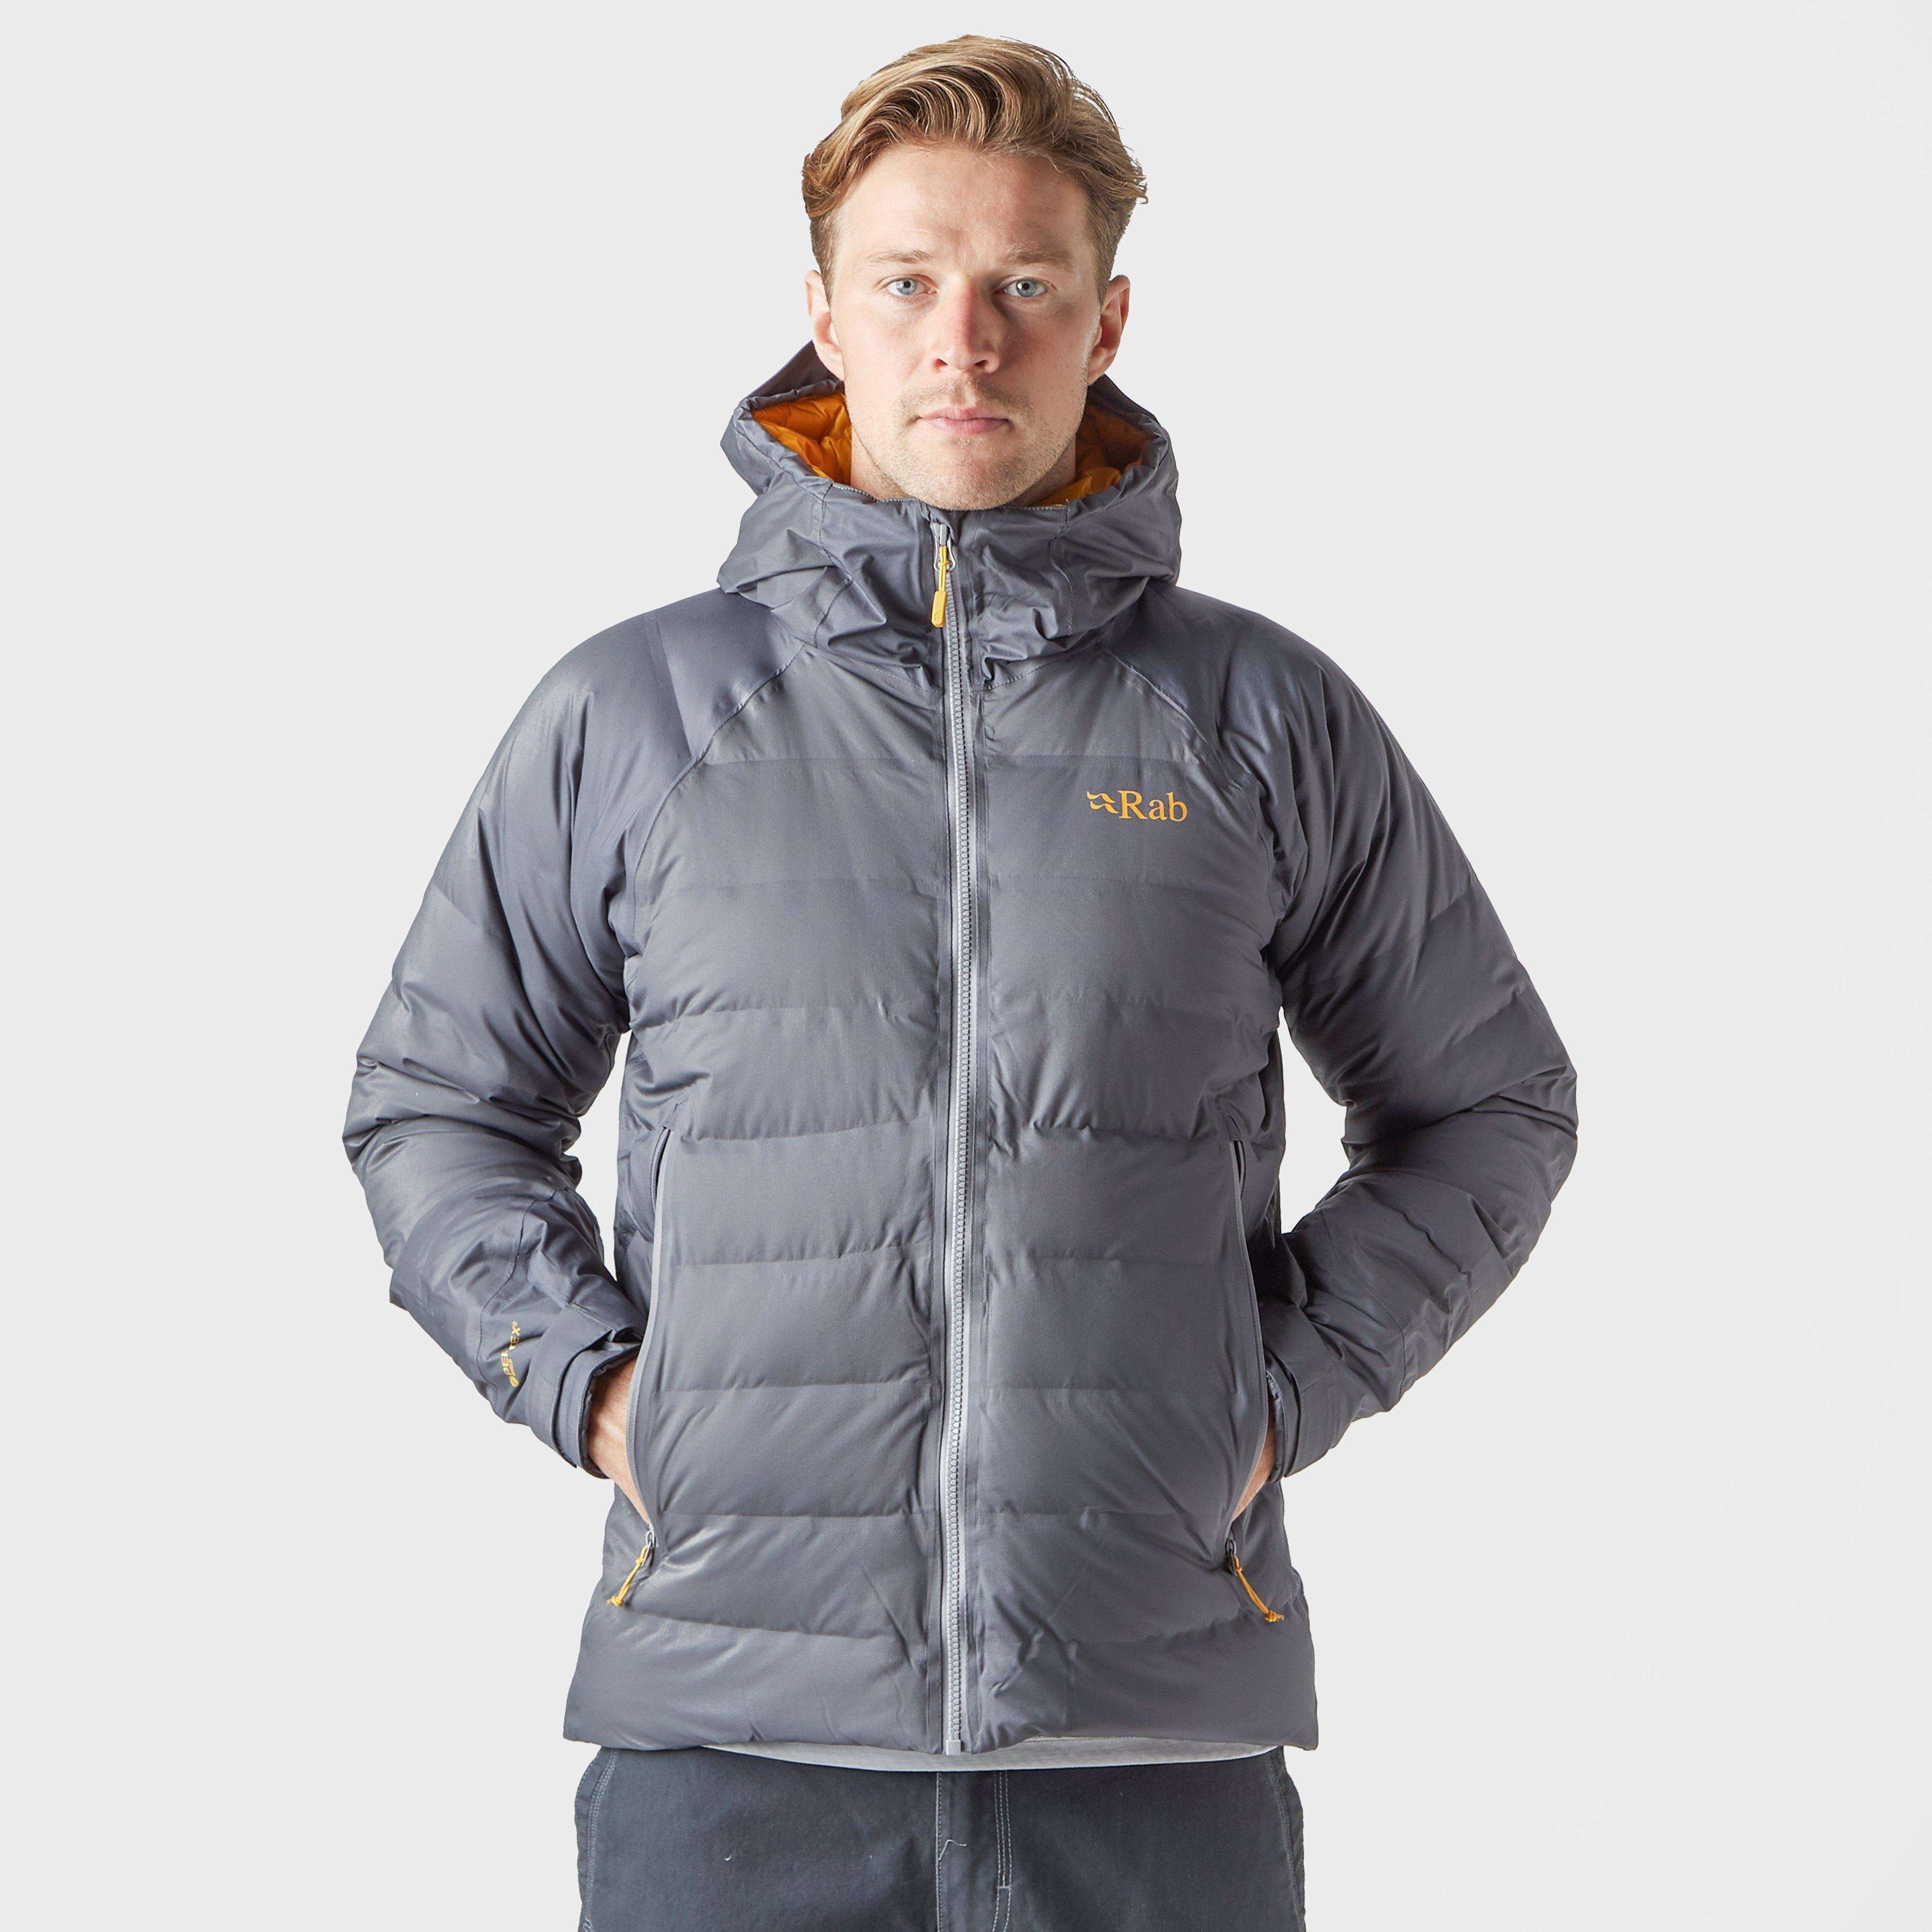 RAB Men's Valiance Insulated Jacket